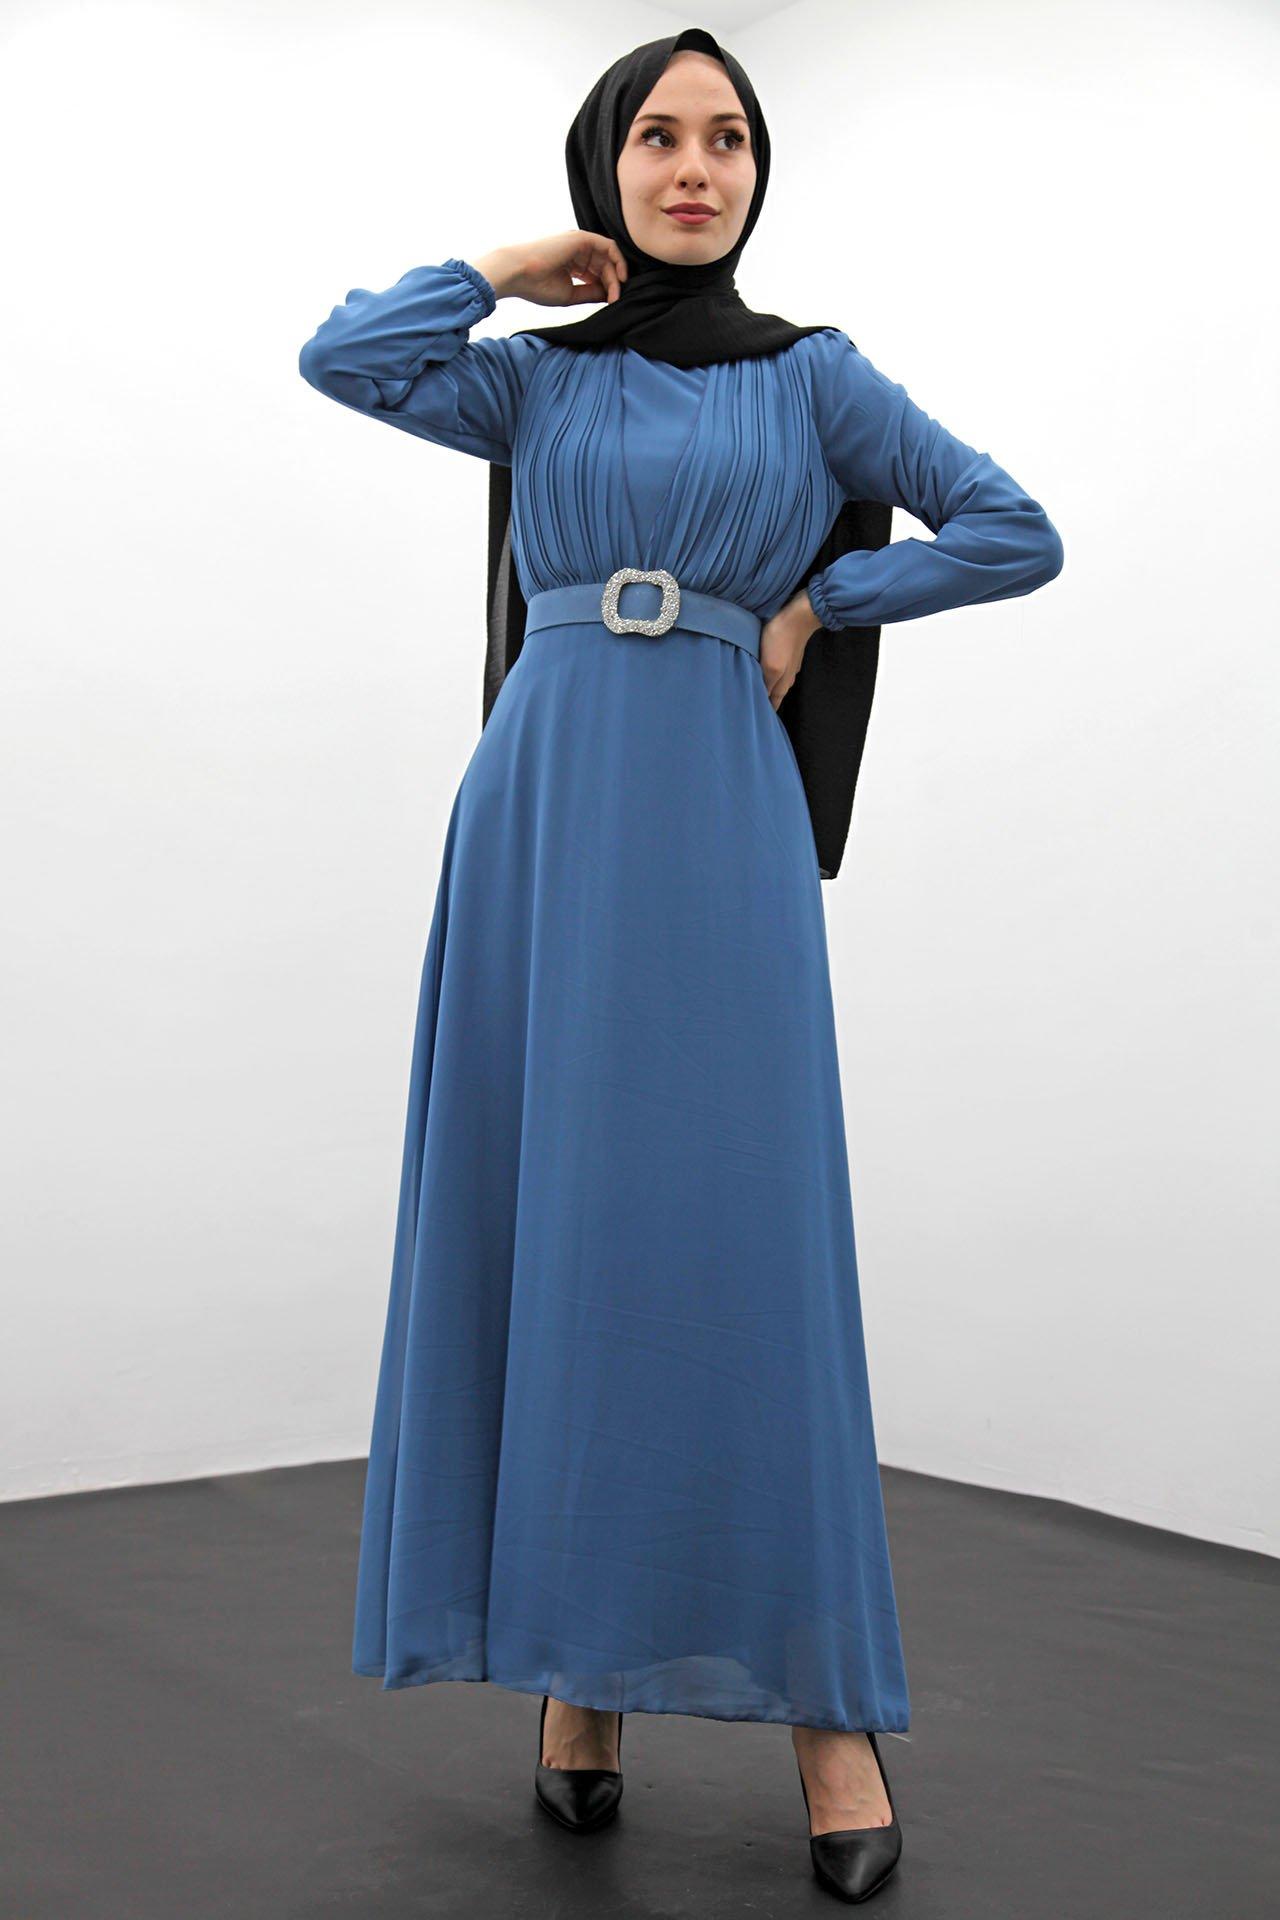 GİZAGİYİM - Taş Kemer Pilisoley Elbise İndigo